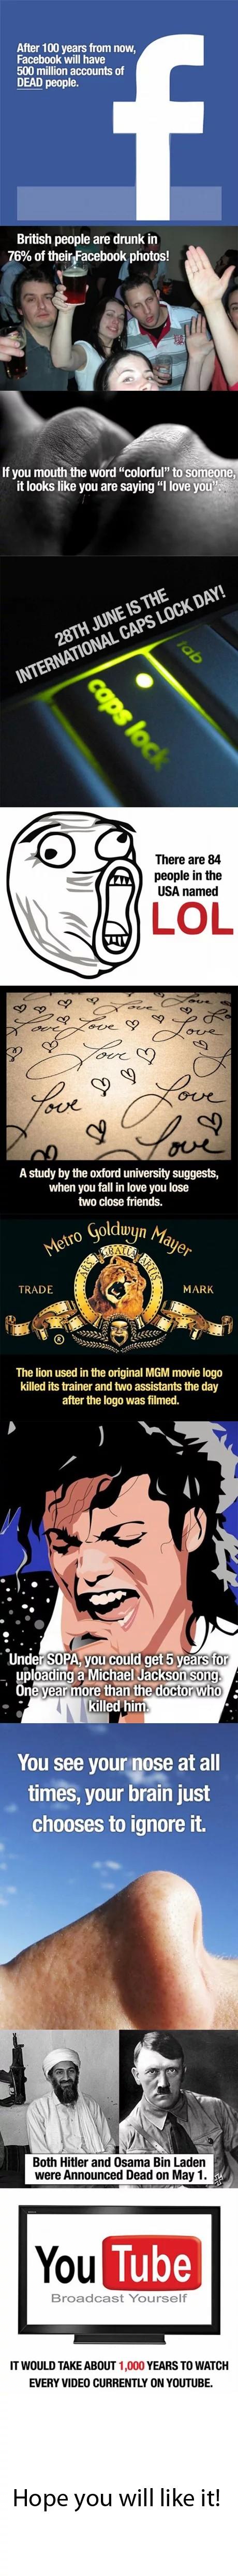 cool random facts